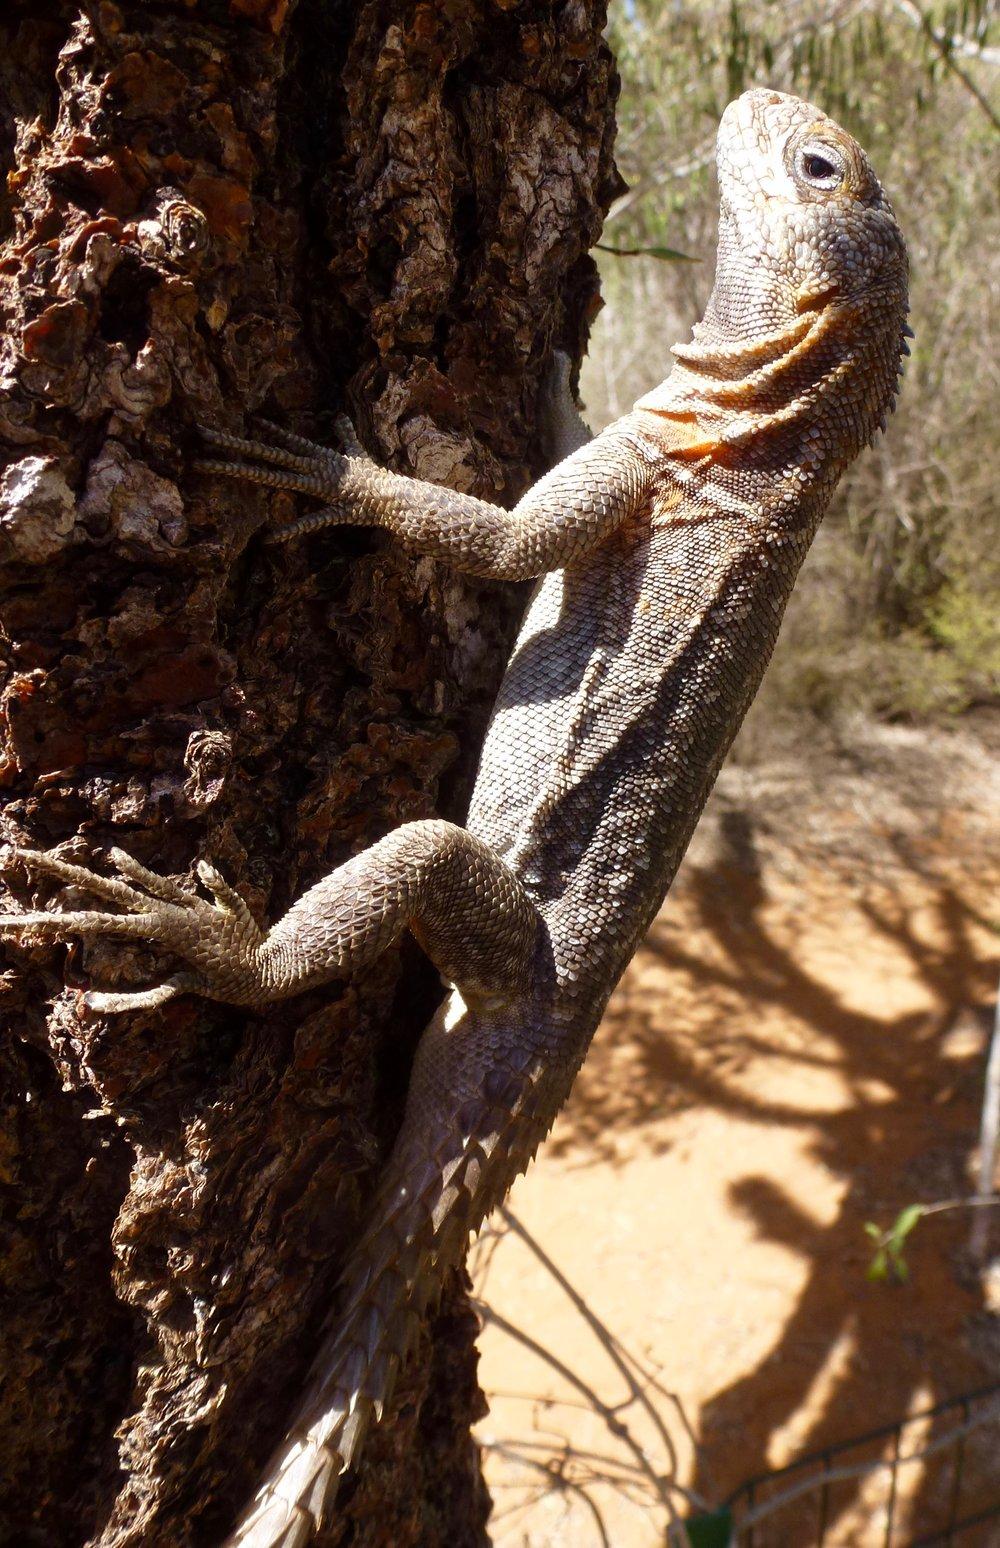 Spiny tail iguana, O plurus cyclurus.